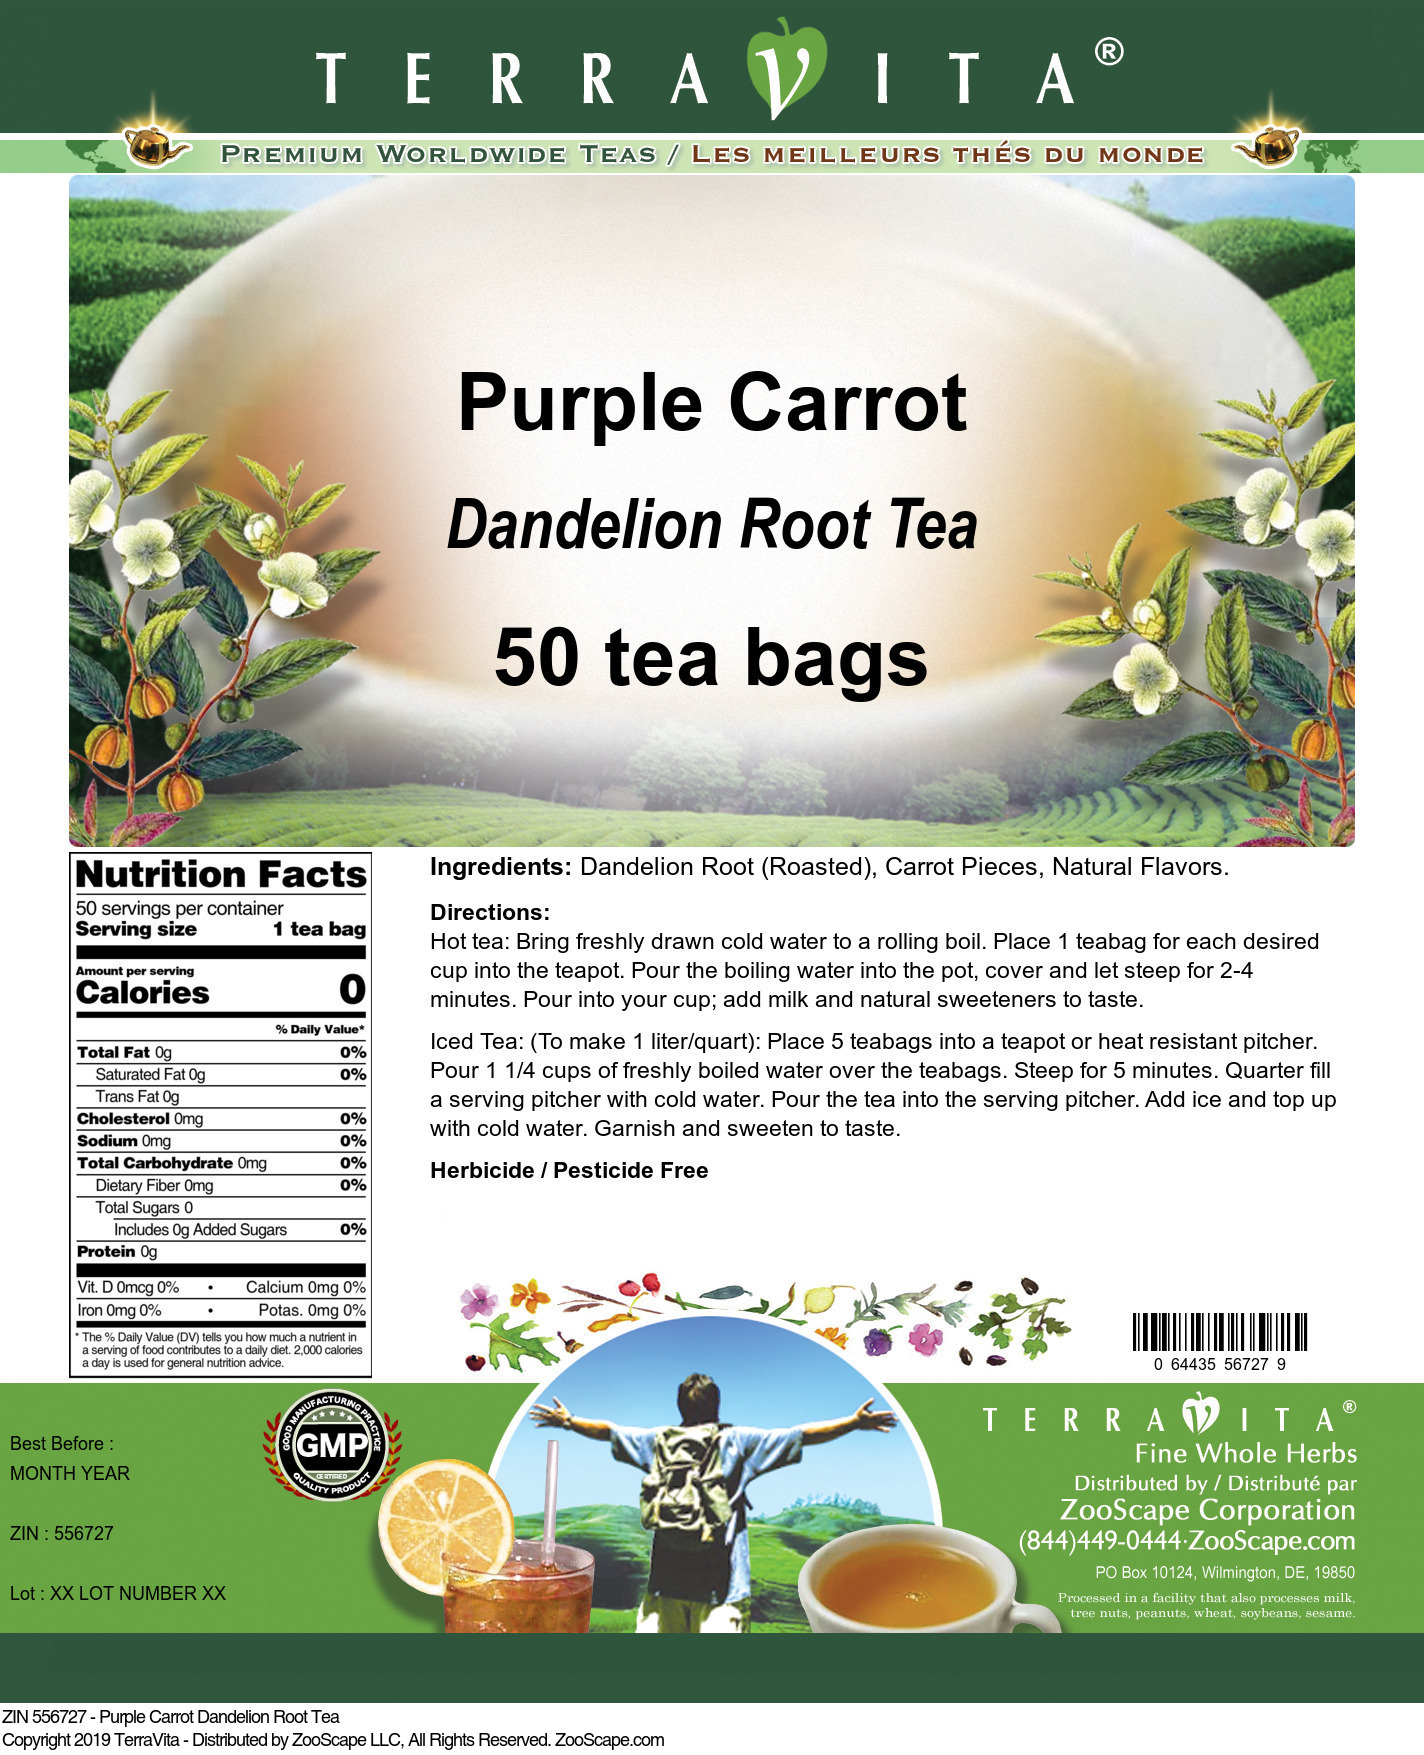 Purple Carrot Dandelion Root Tea